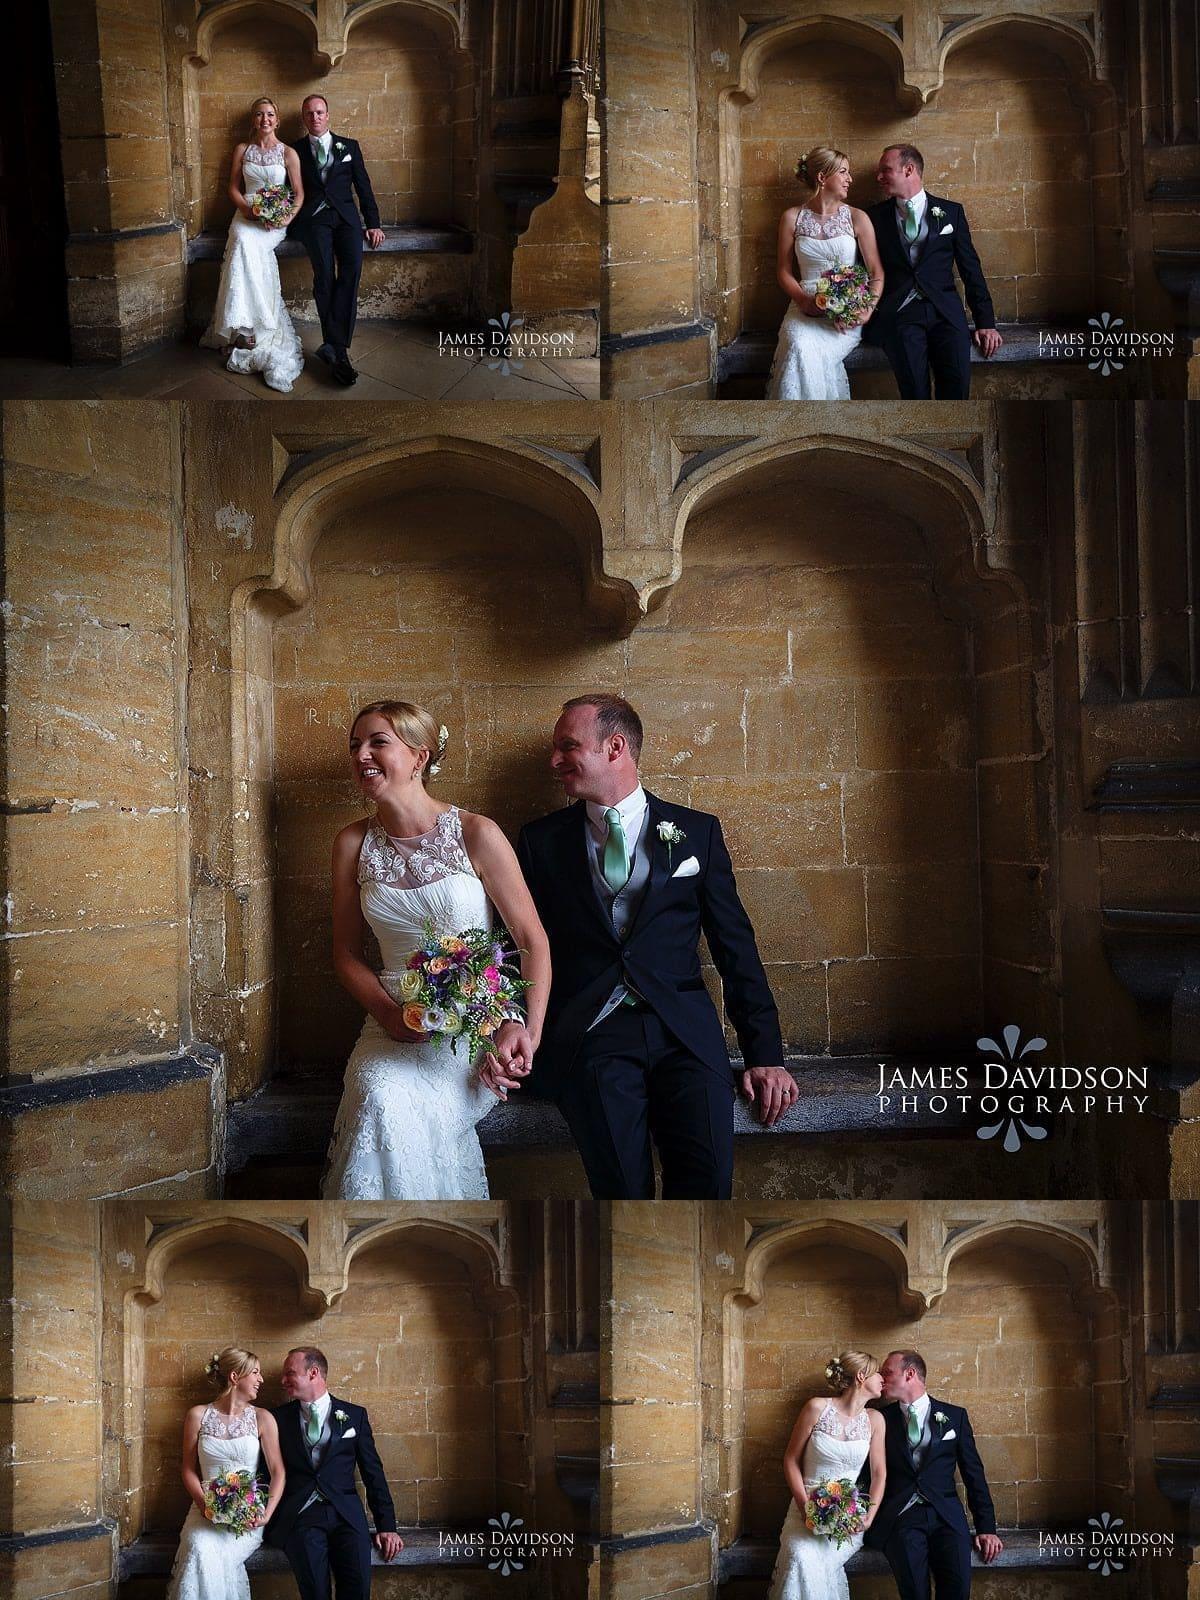 Hengrave-wedding-photography-093.jpg